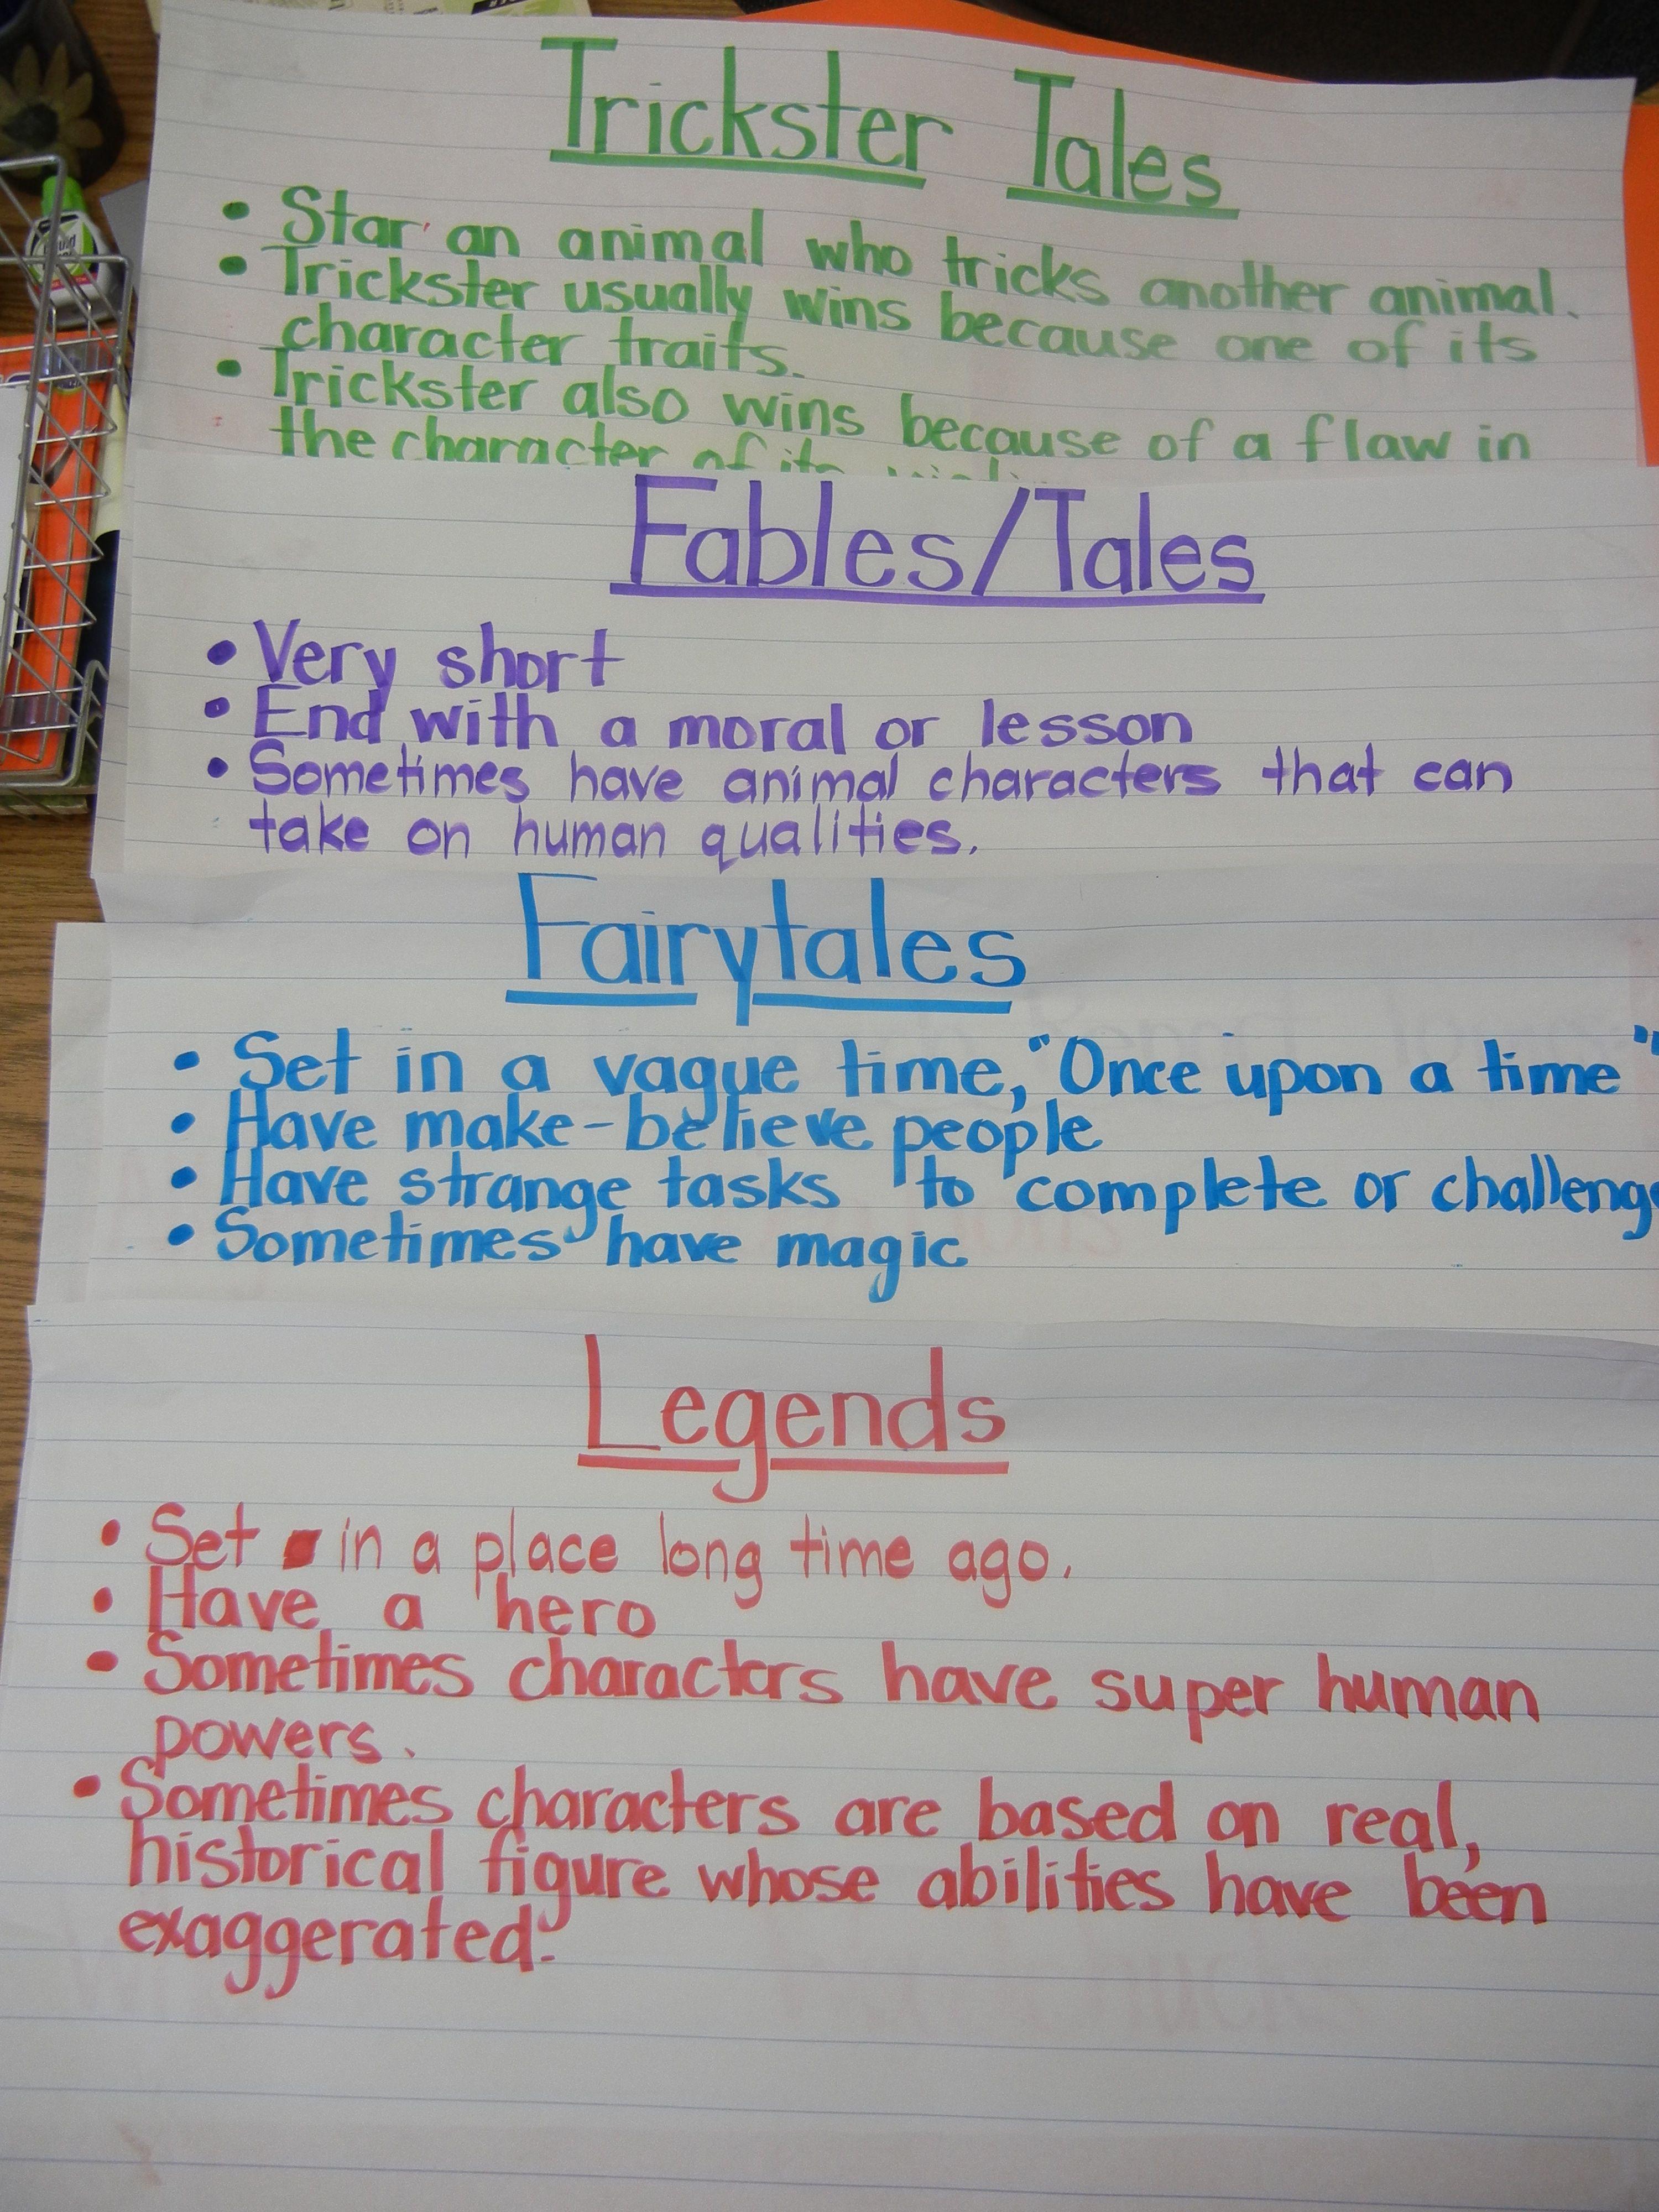 Genres of academic writing skills